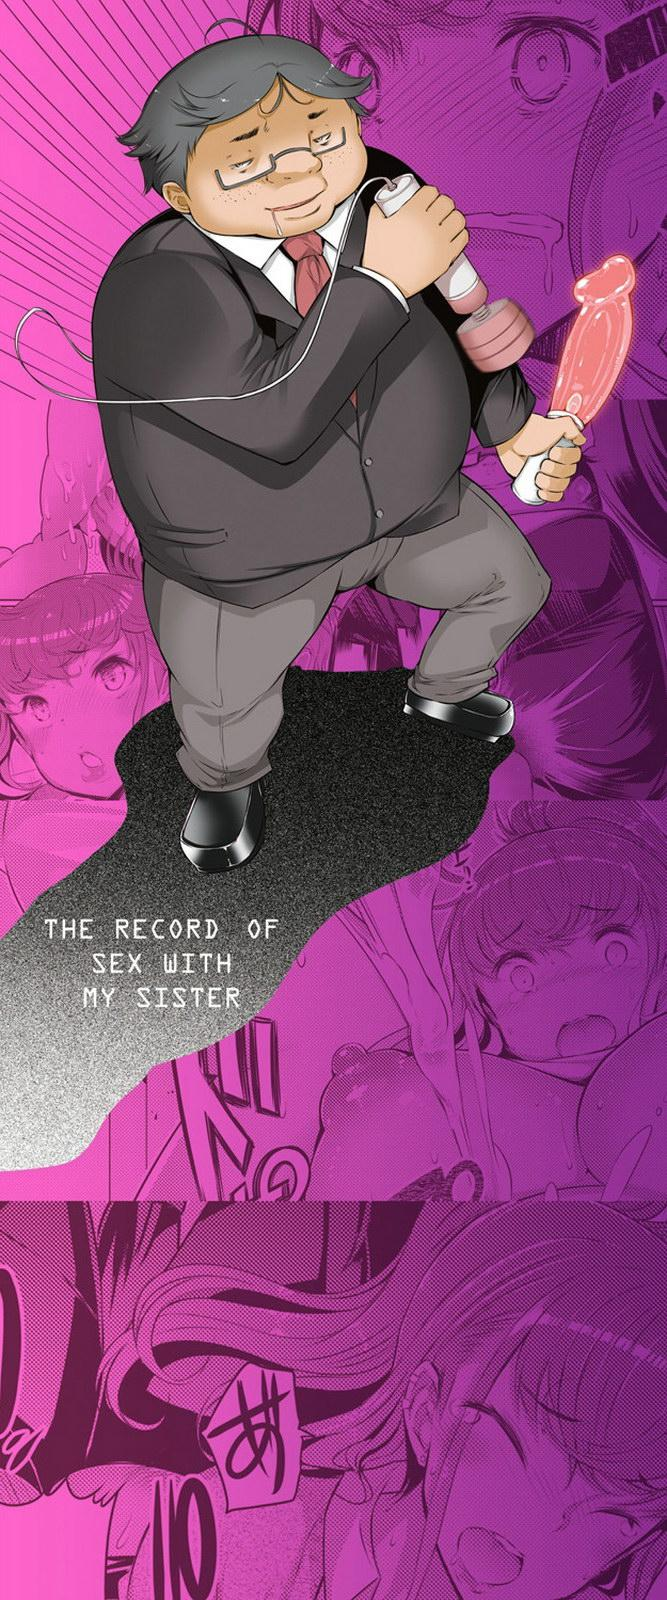 Imouto Kansatsu Nikki - The Record of Sex with My Sister 208